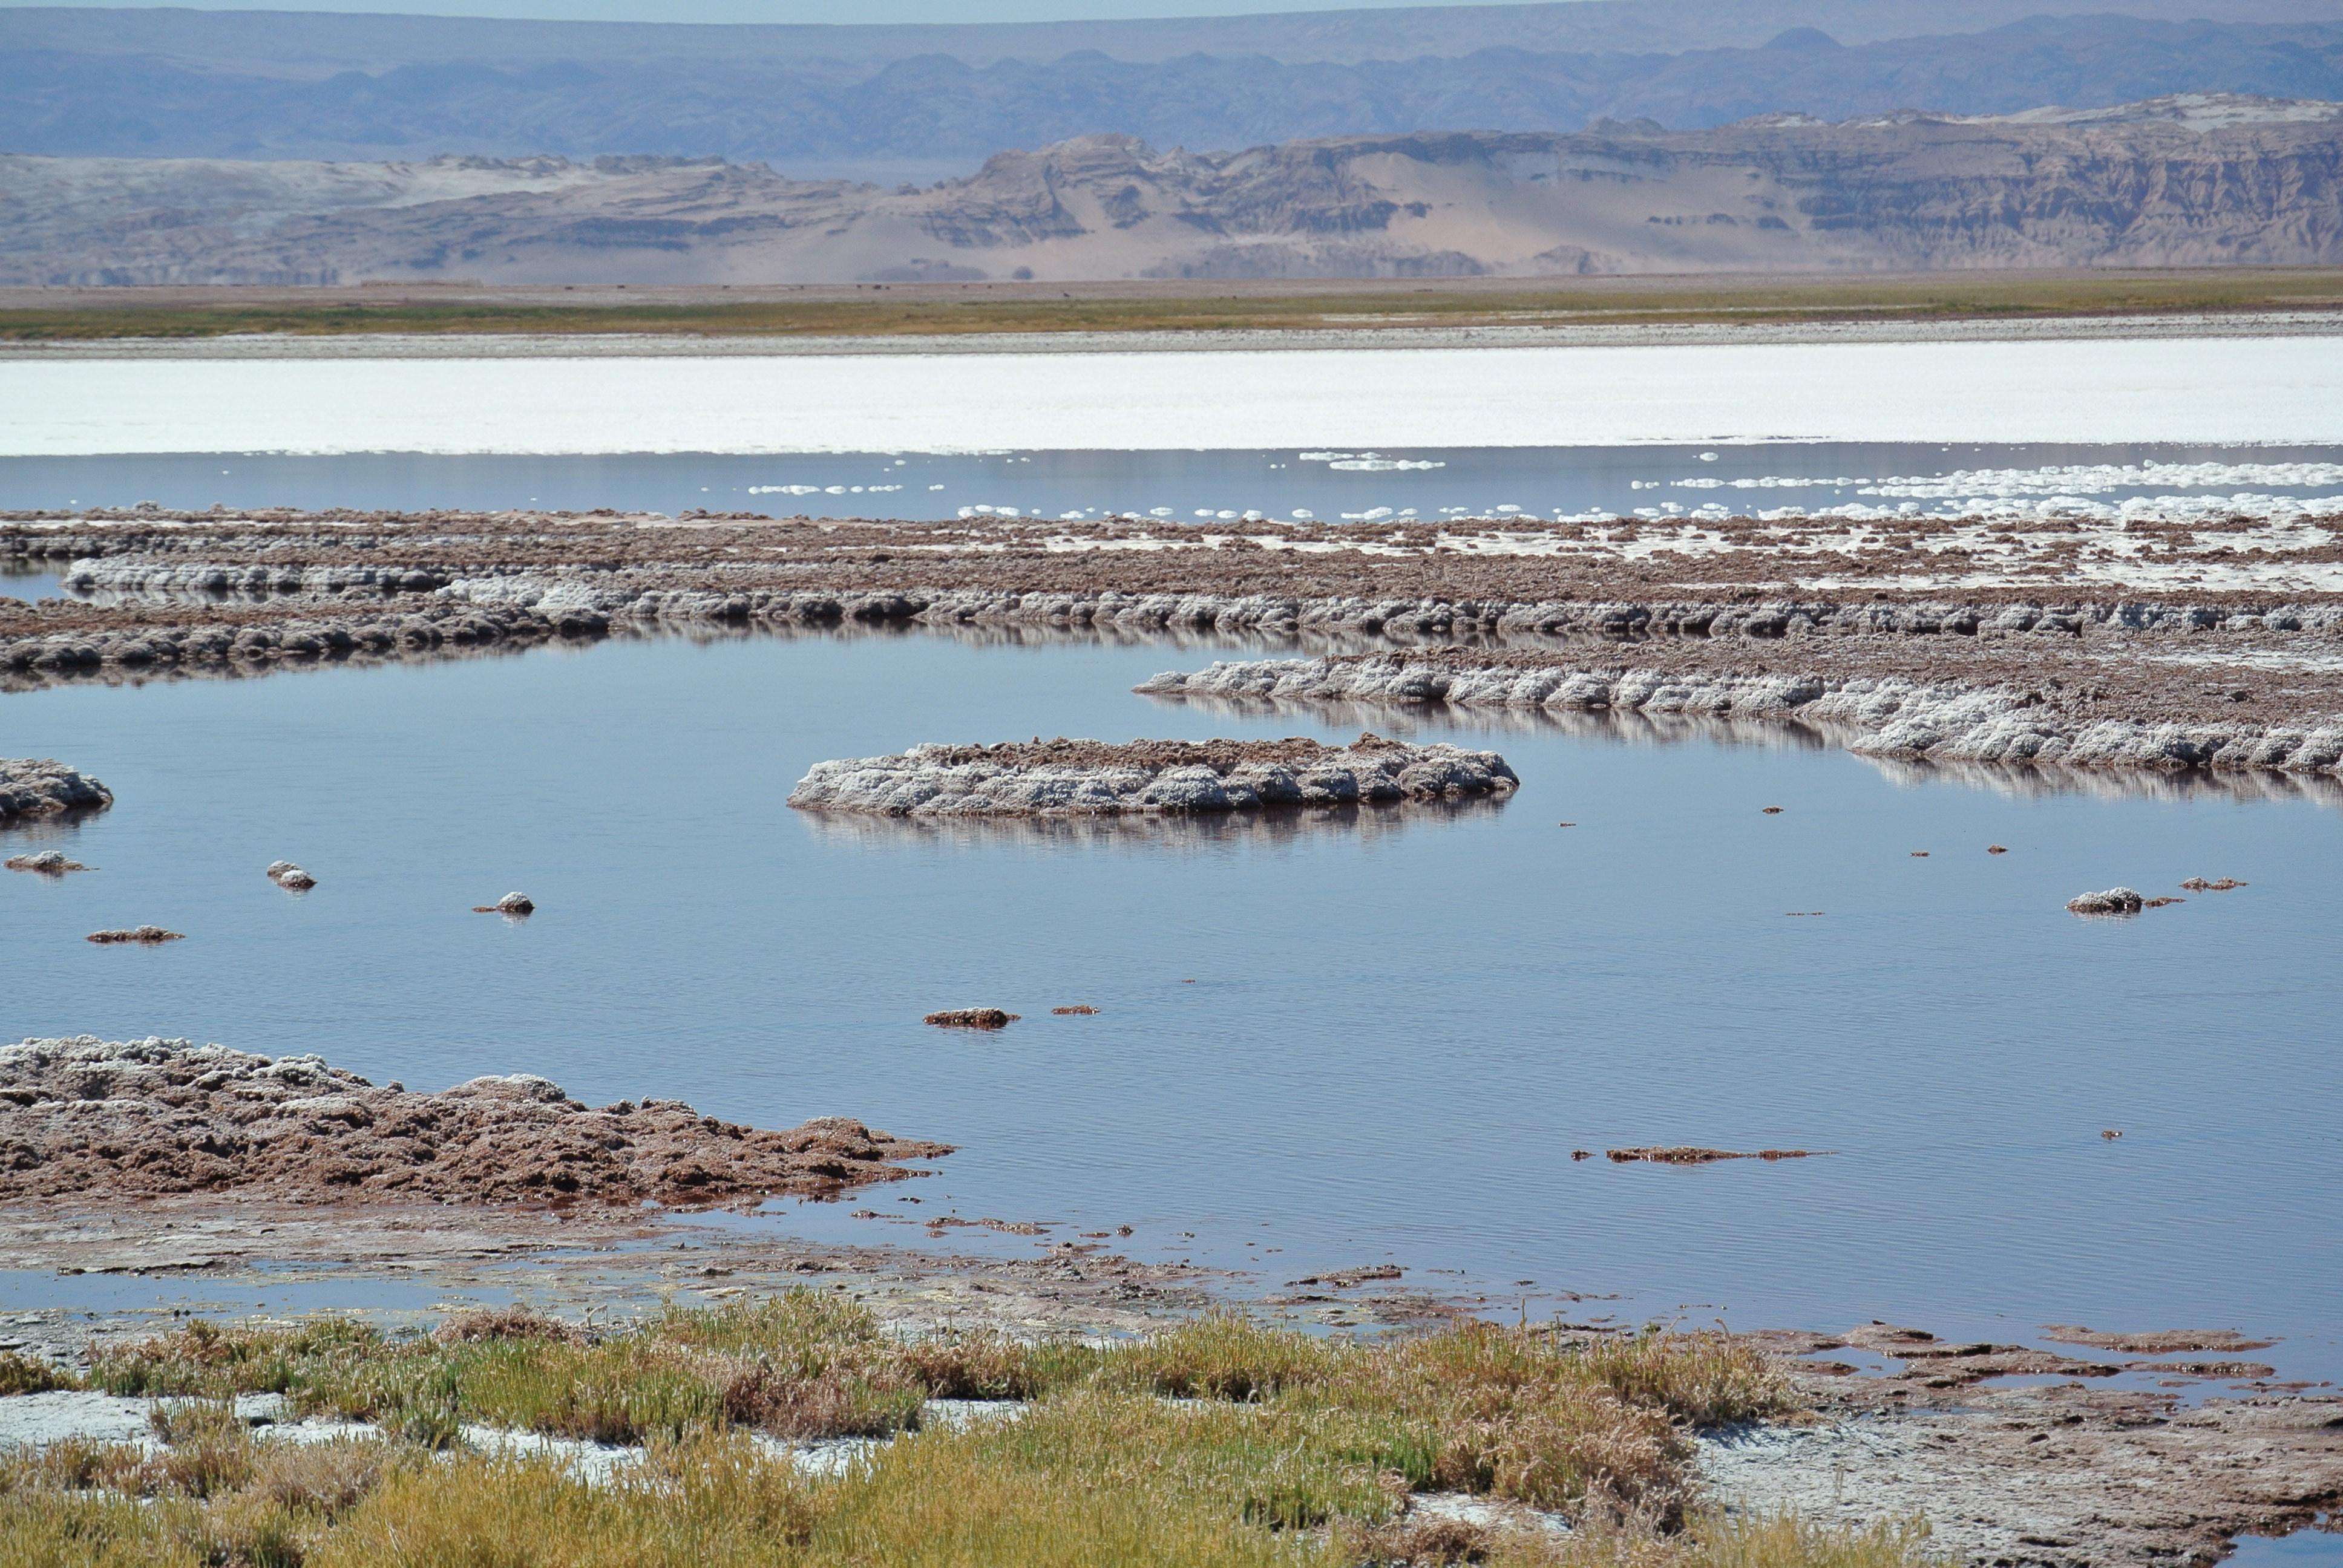 029 0912 Mirador - Salar de Atacama 171jpeg